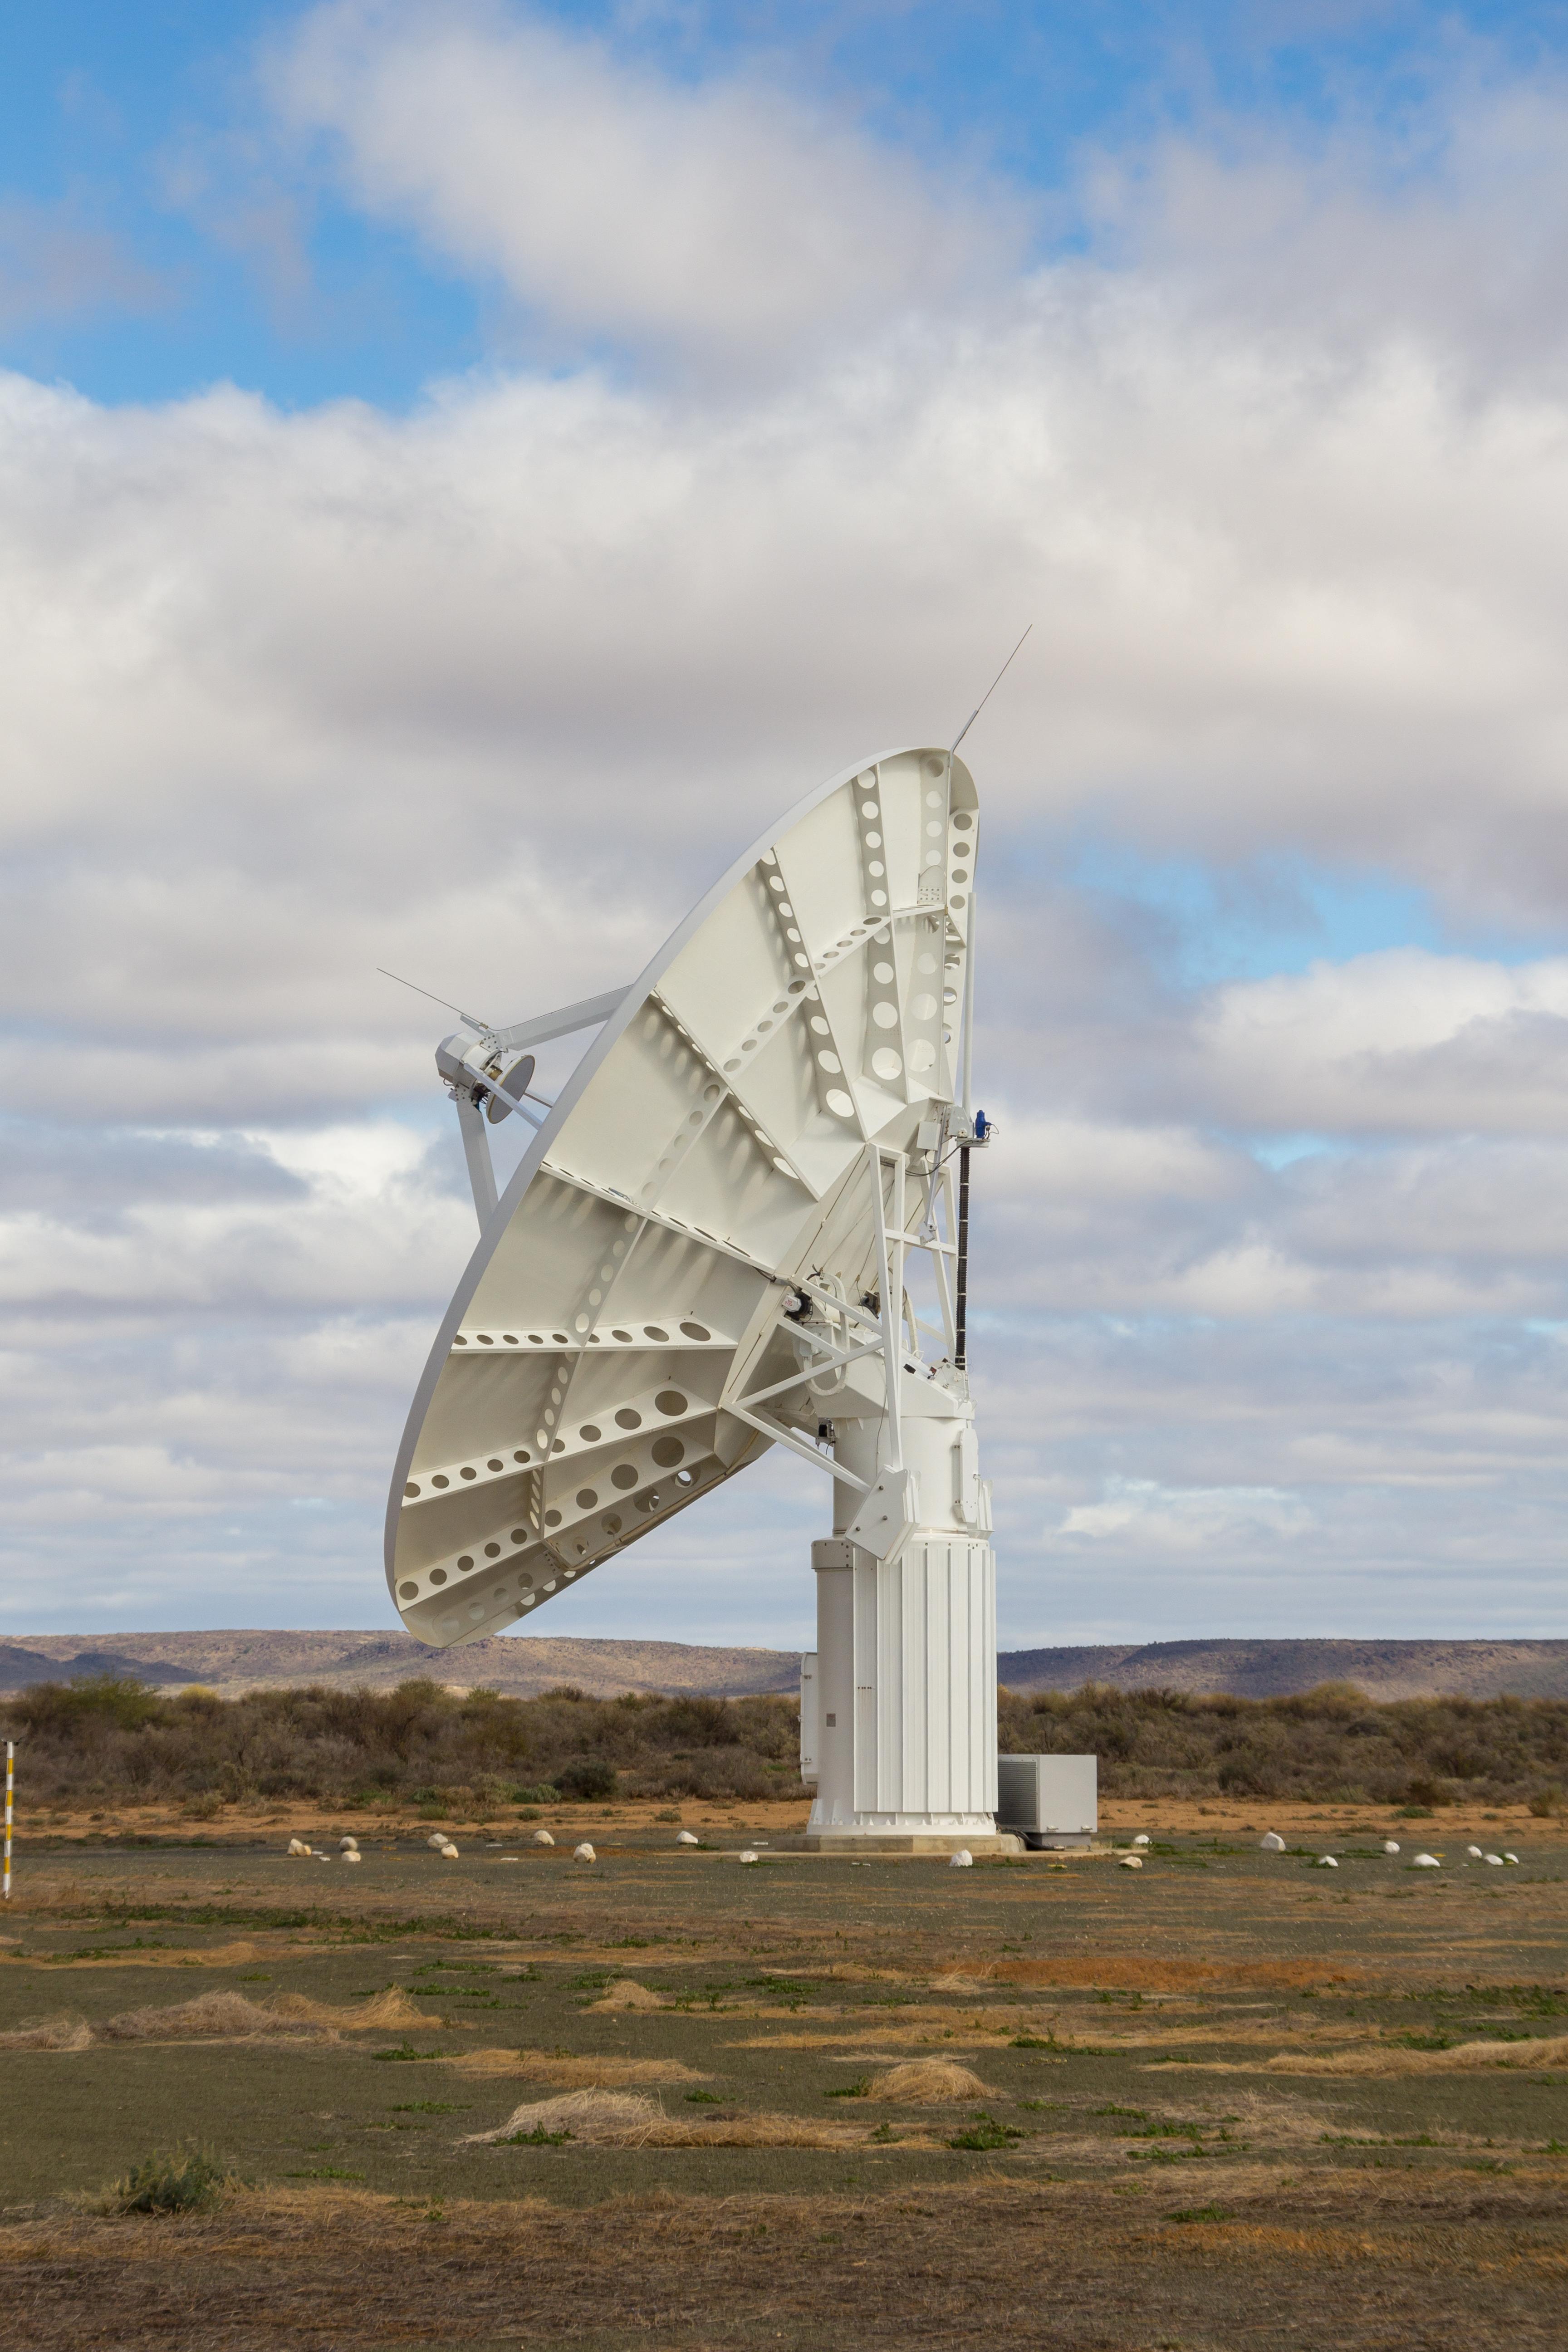 KAT-7 世界最大射电天文望远镜 - wuwei1101 - 西花社